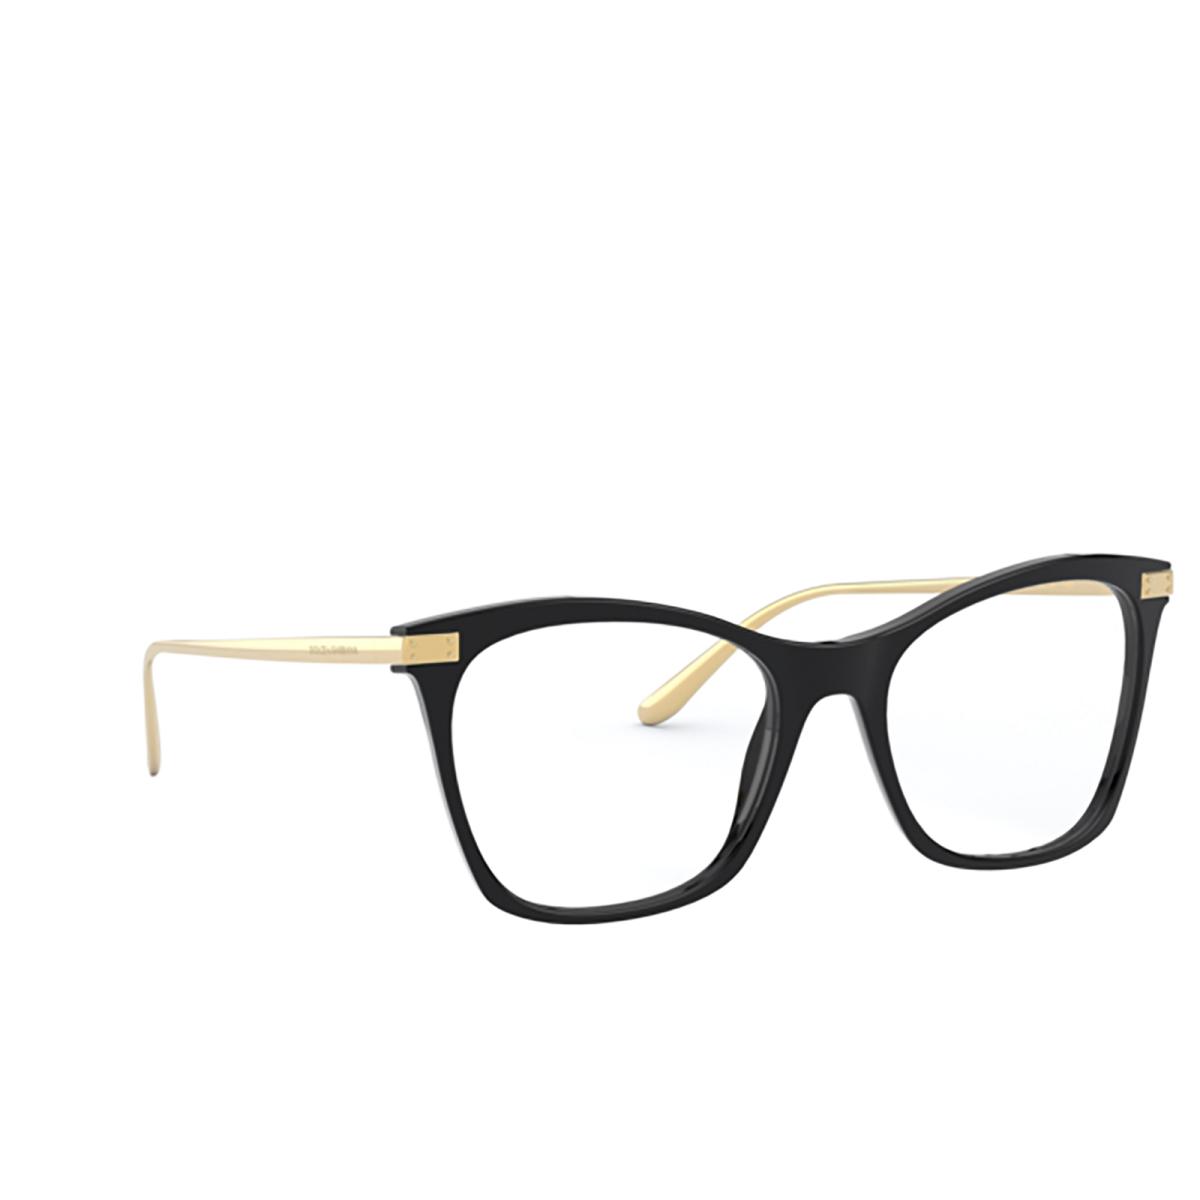 Dolce & Gabbana® Square Eyeglasses: DG3331 color Black 501.